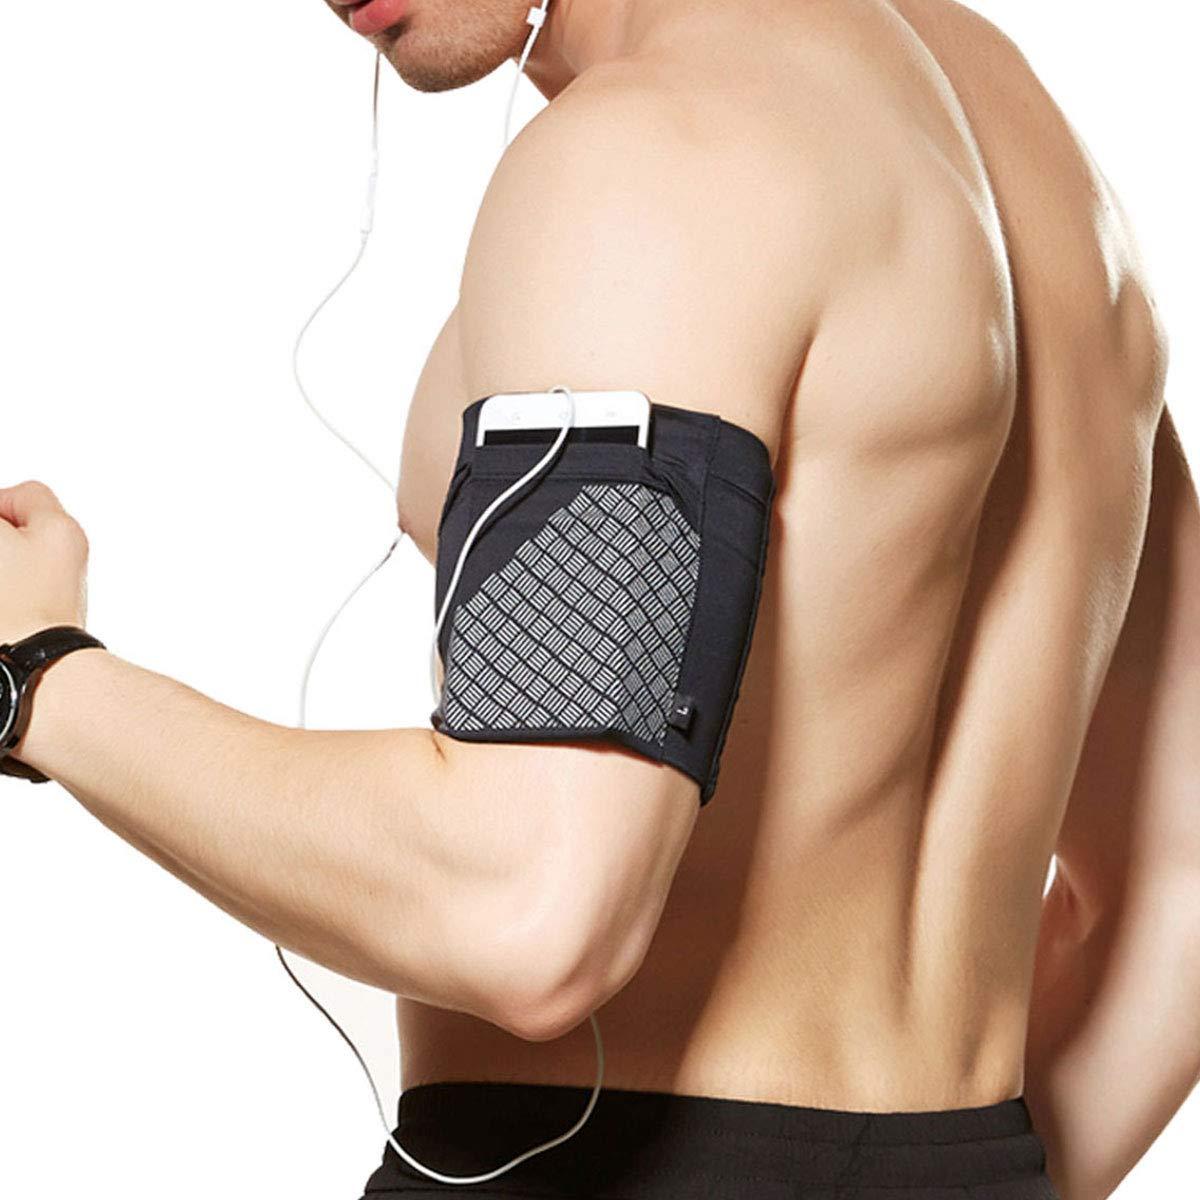 Ailzos Running Lightweight Comfortable Exercise